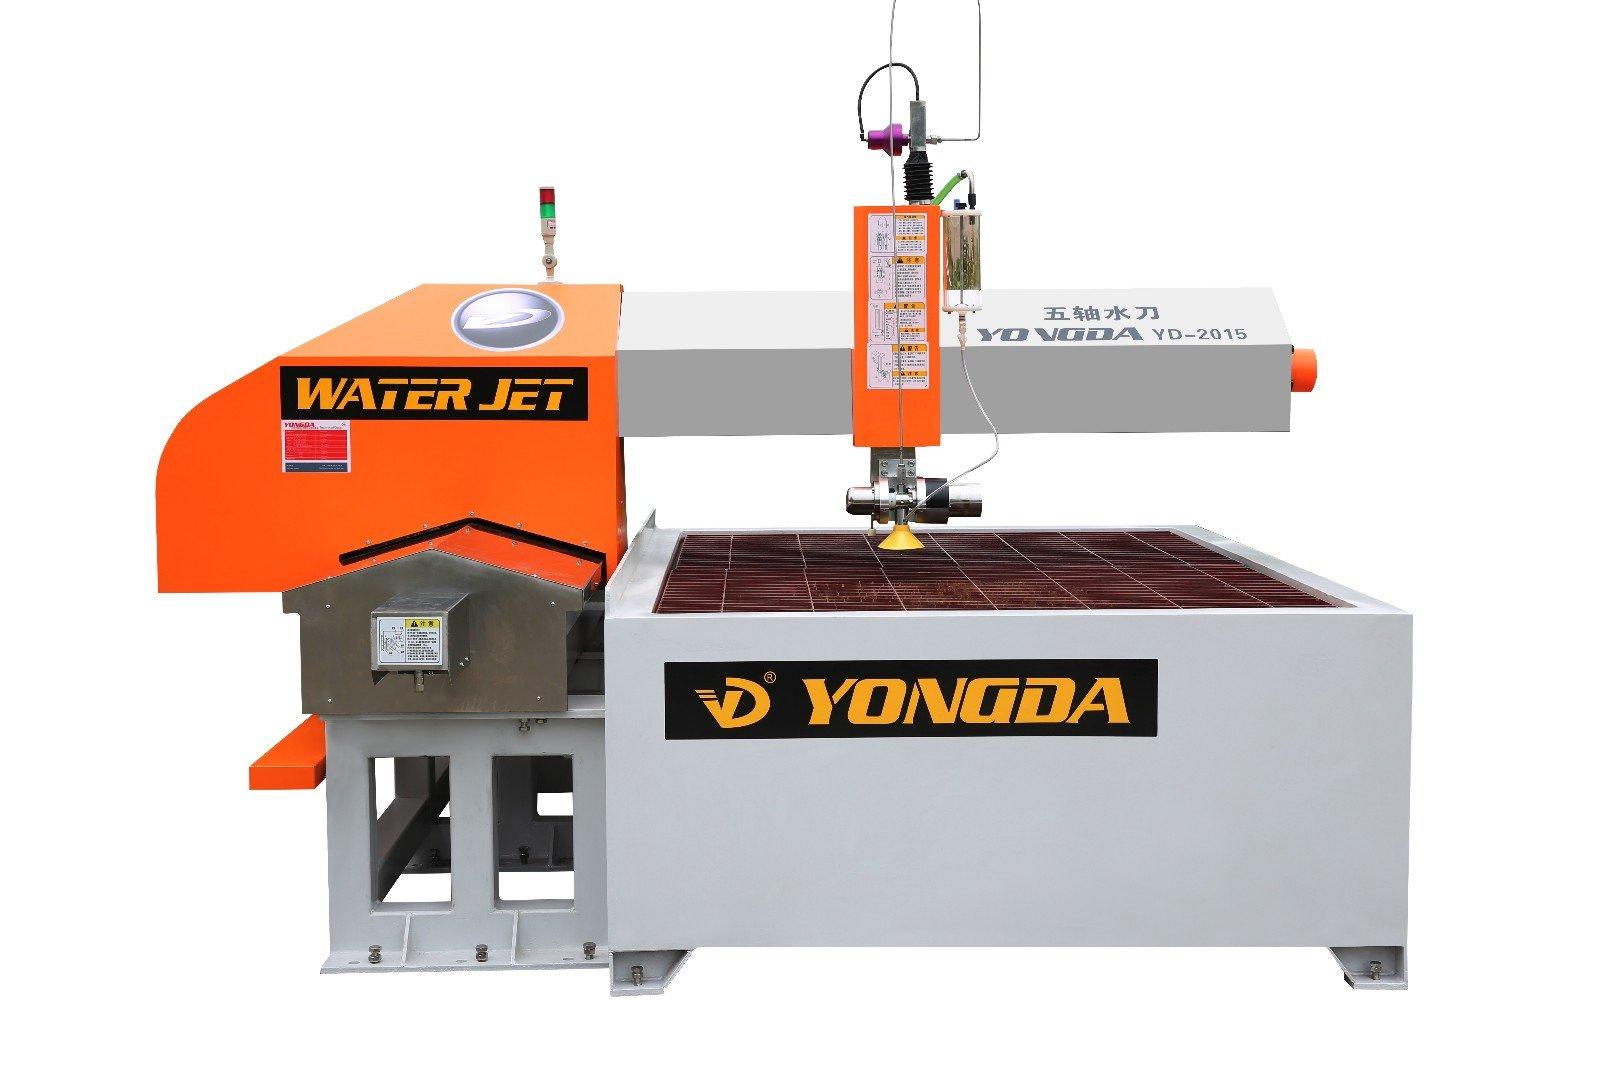 YONGDA-Yongda water jet faster cutting speed, higher return on investment-4